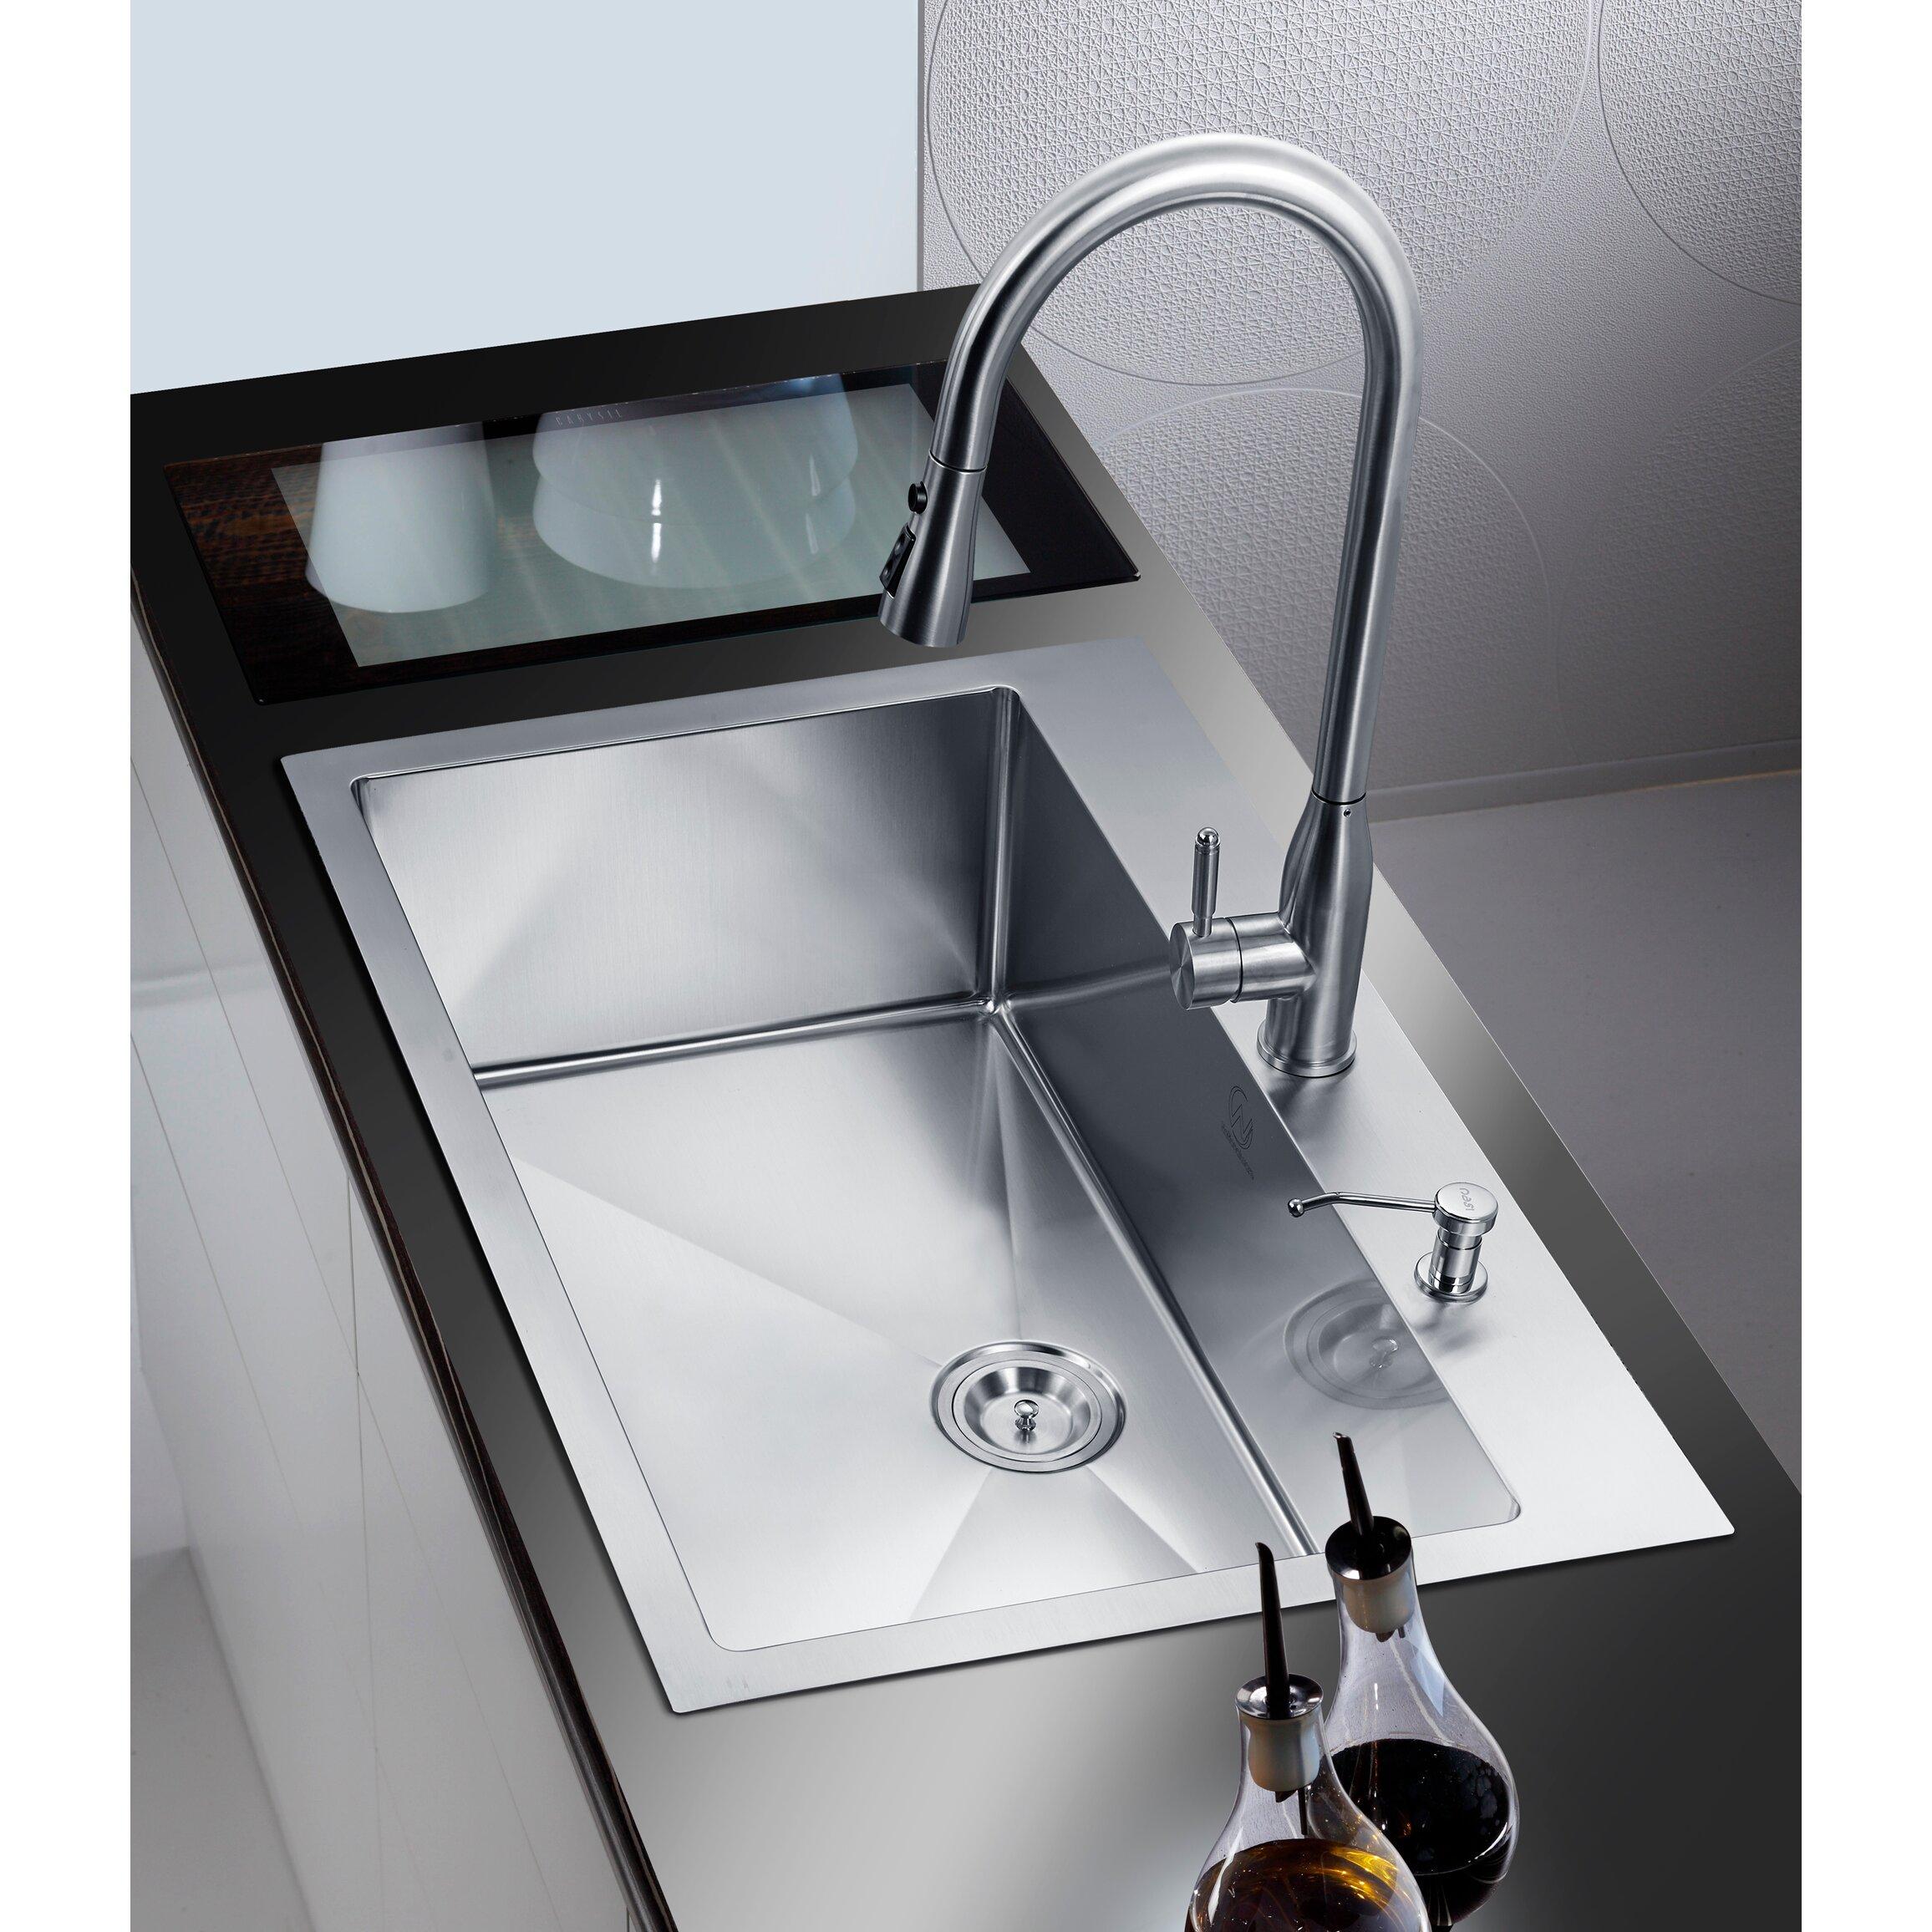 dCOR design 33 quot  x 22 quot  Single Drop In. dCOR design 33  x 22  Single Drop In Kitchen Sink   Reviews   Wayfair